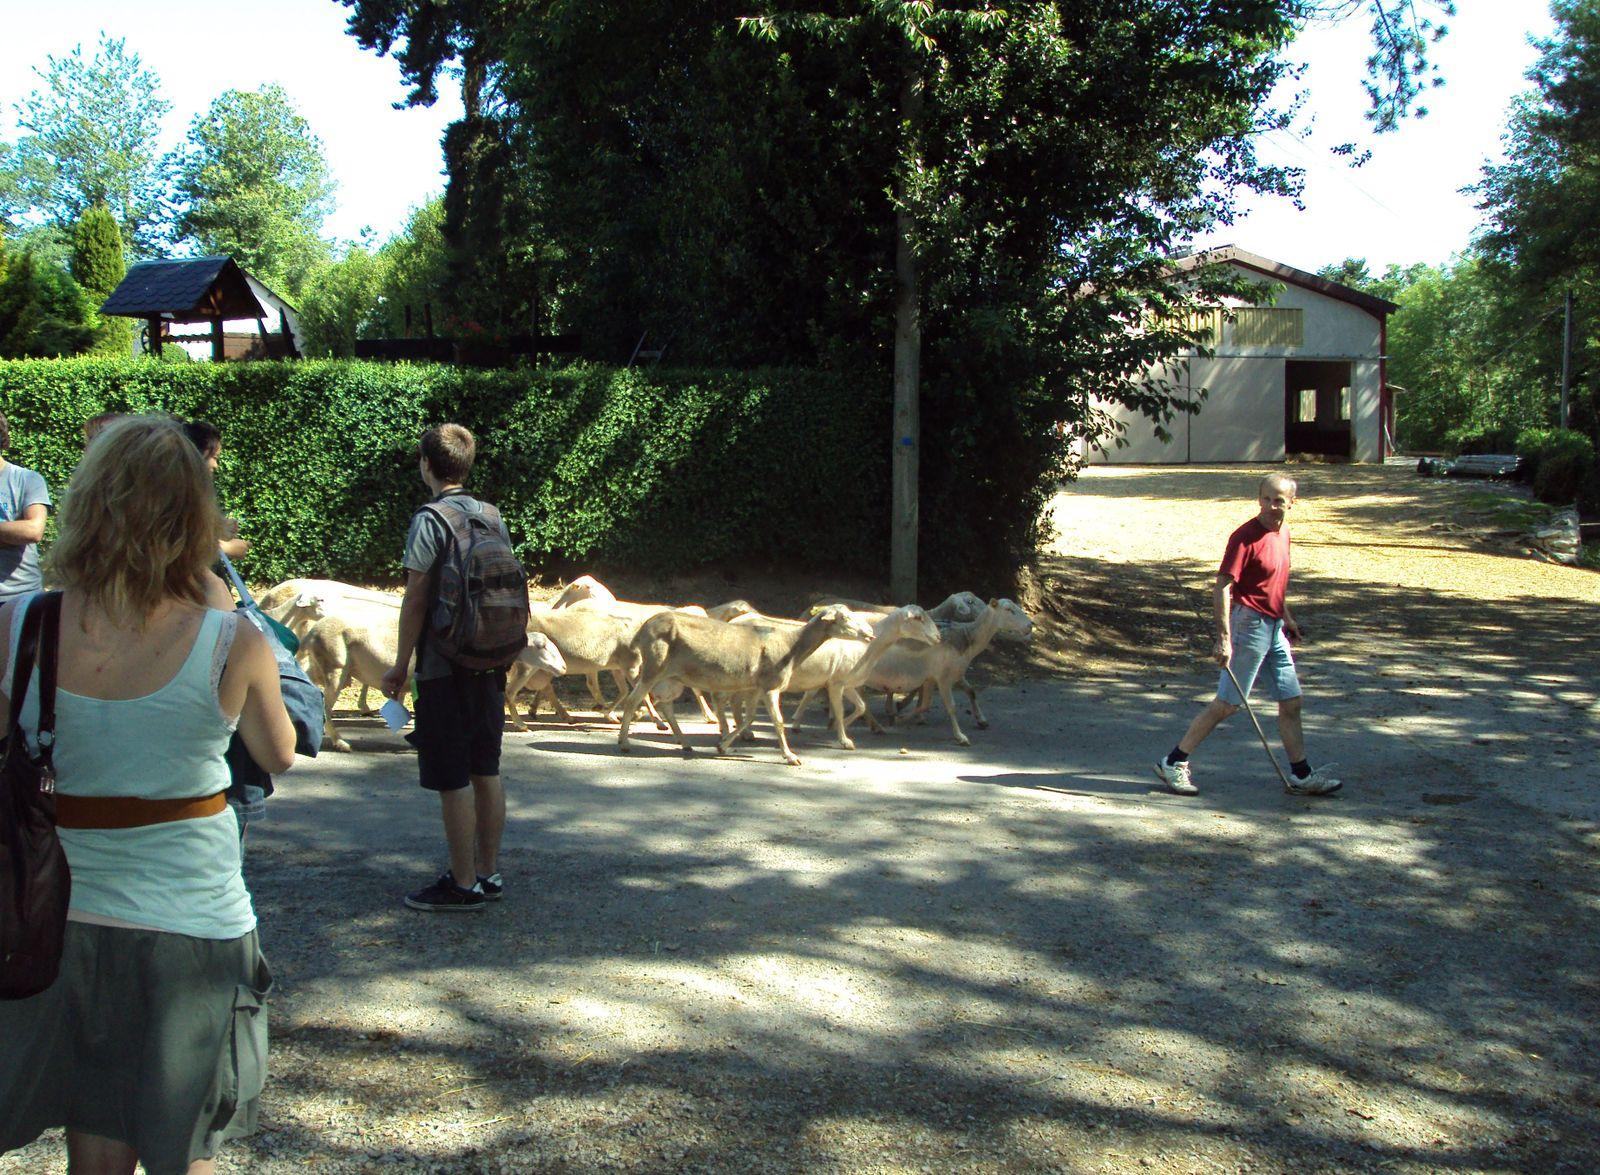 conduire le troupeau de brebis